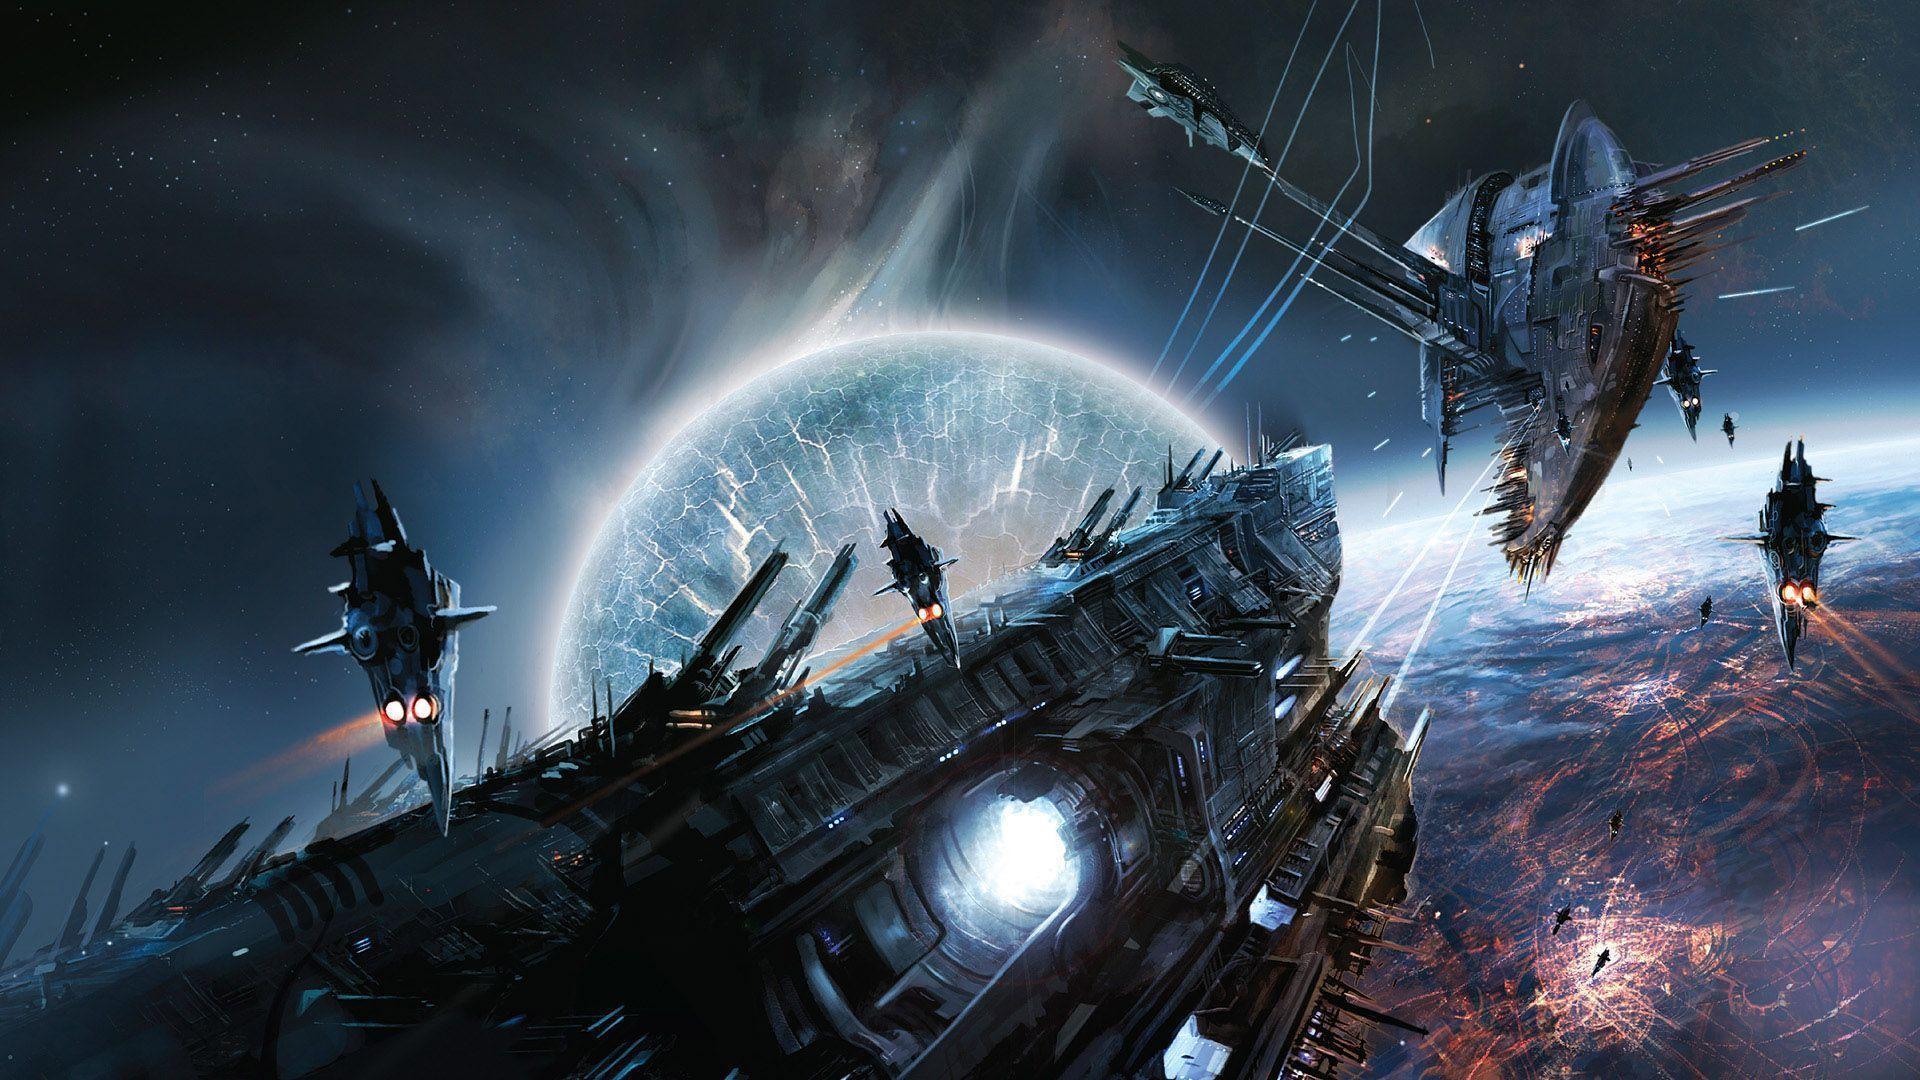 Future Spaceship Picture Wallpaper #4857 #15194 Wallpaper | SpotIMG